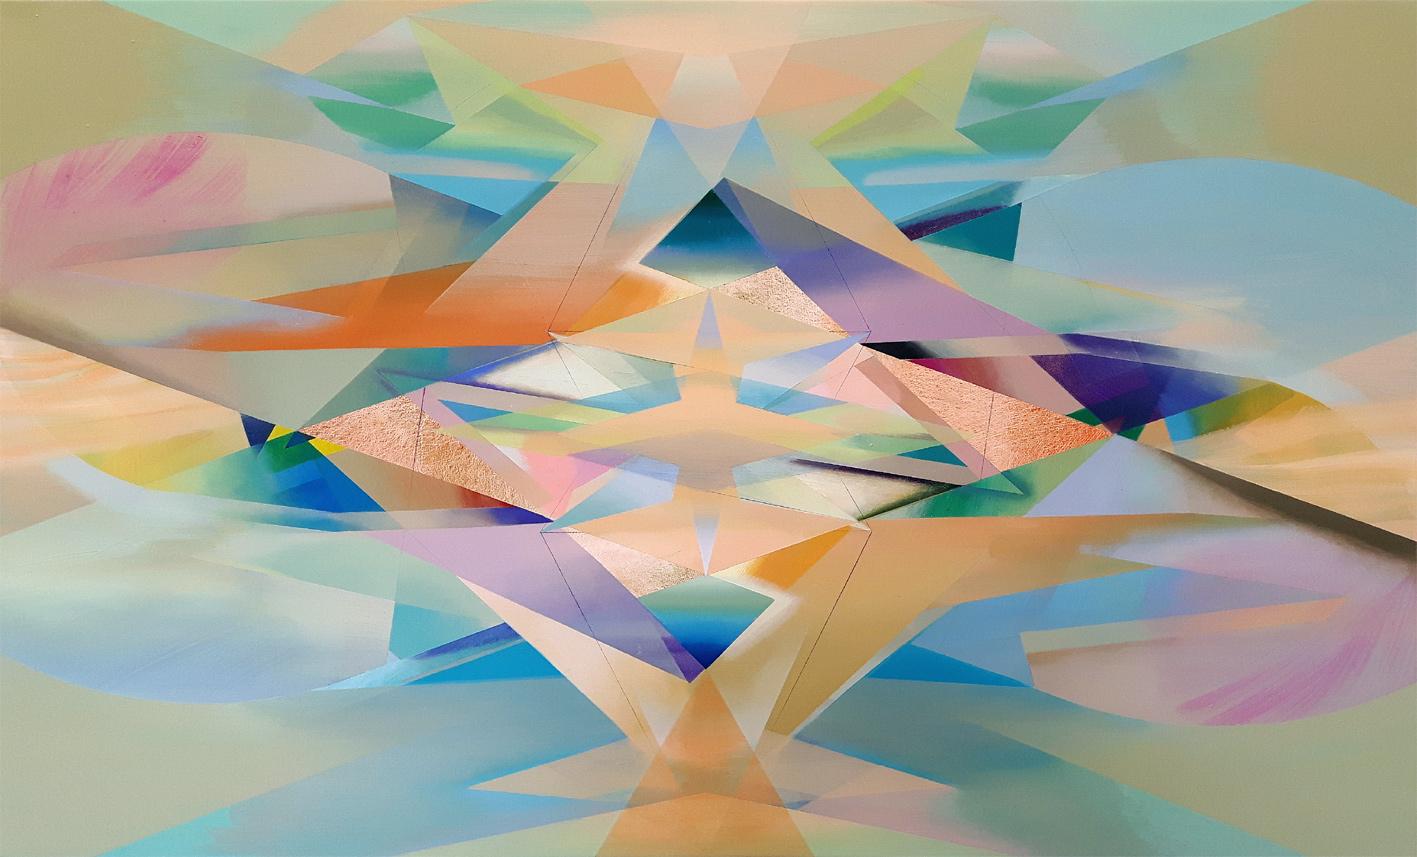 ALEA, Acryl, Pigment und Öl auf Leinwand, 80 x 130 cm